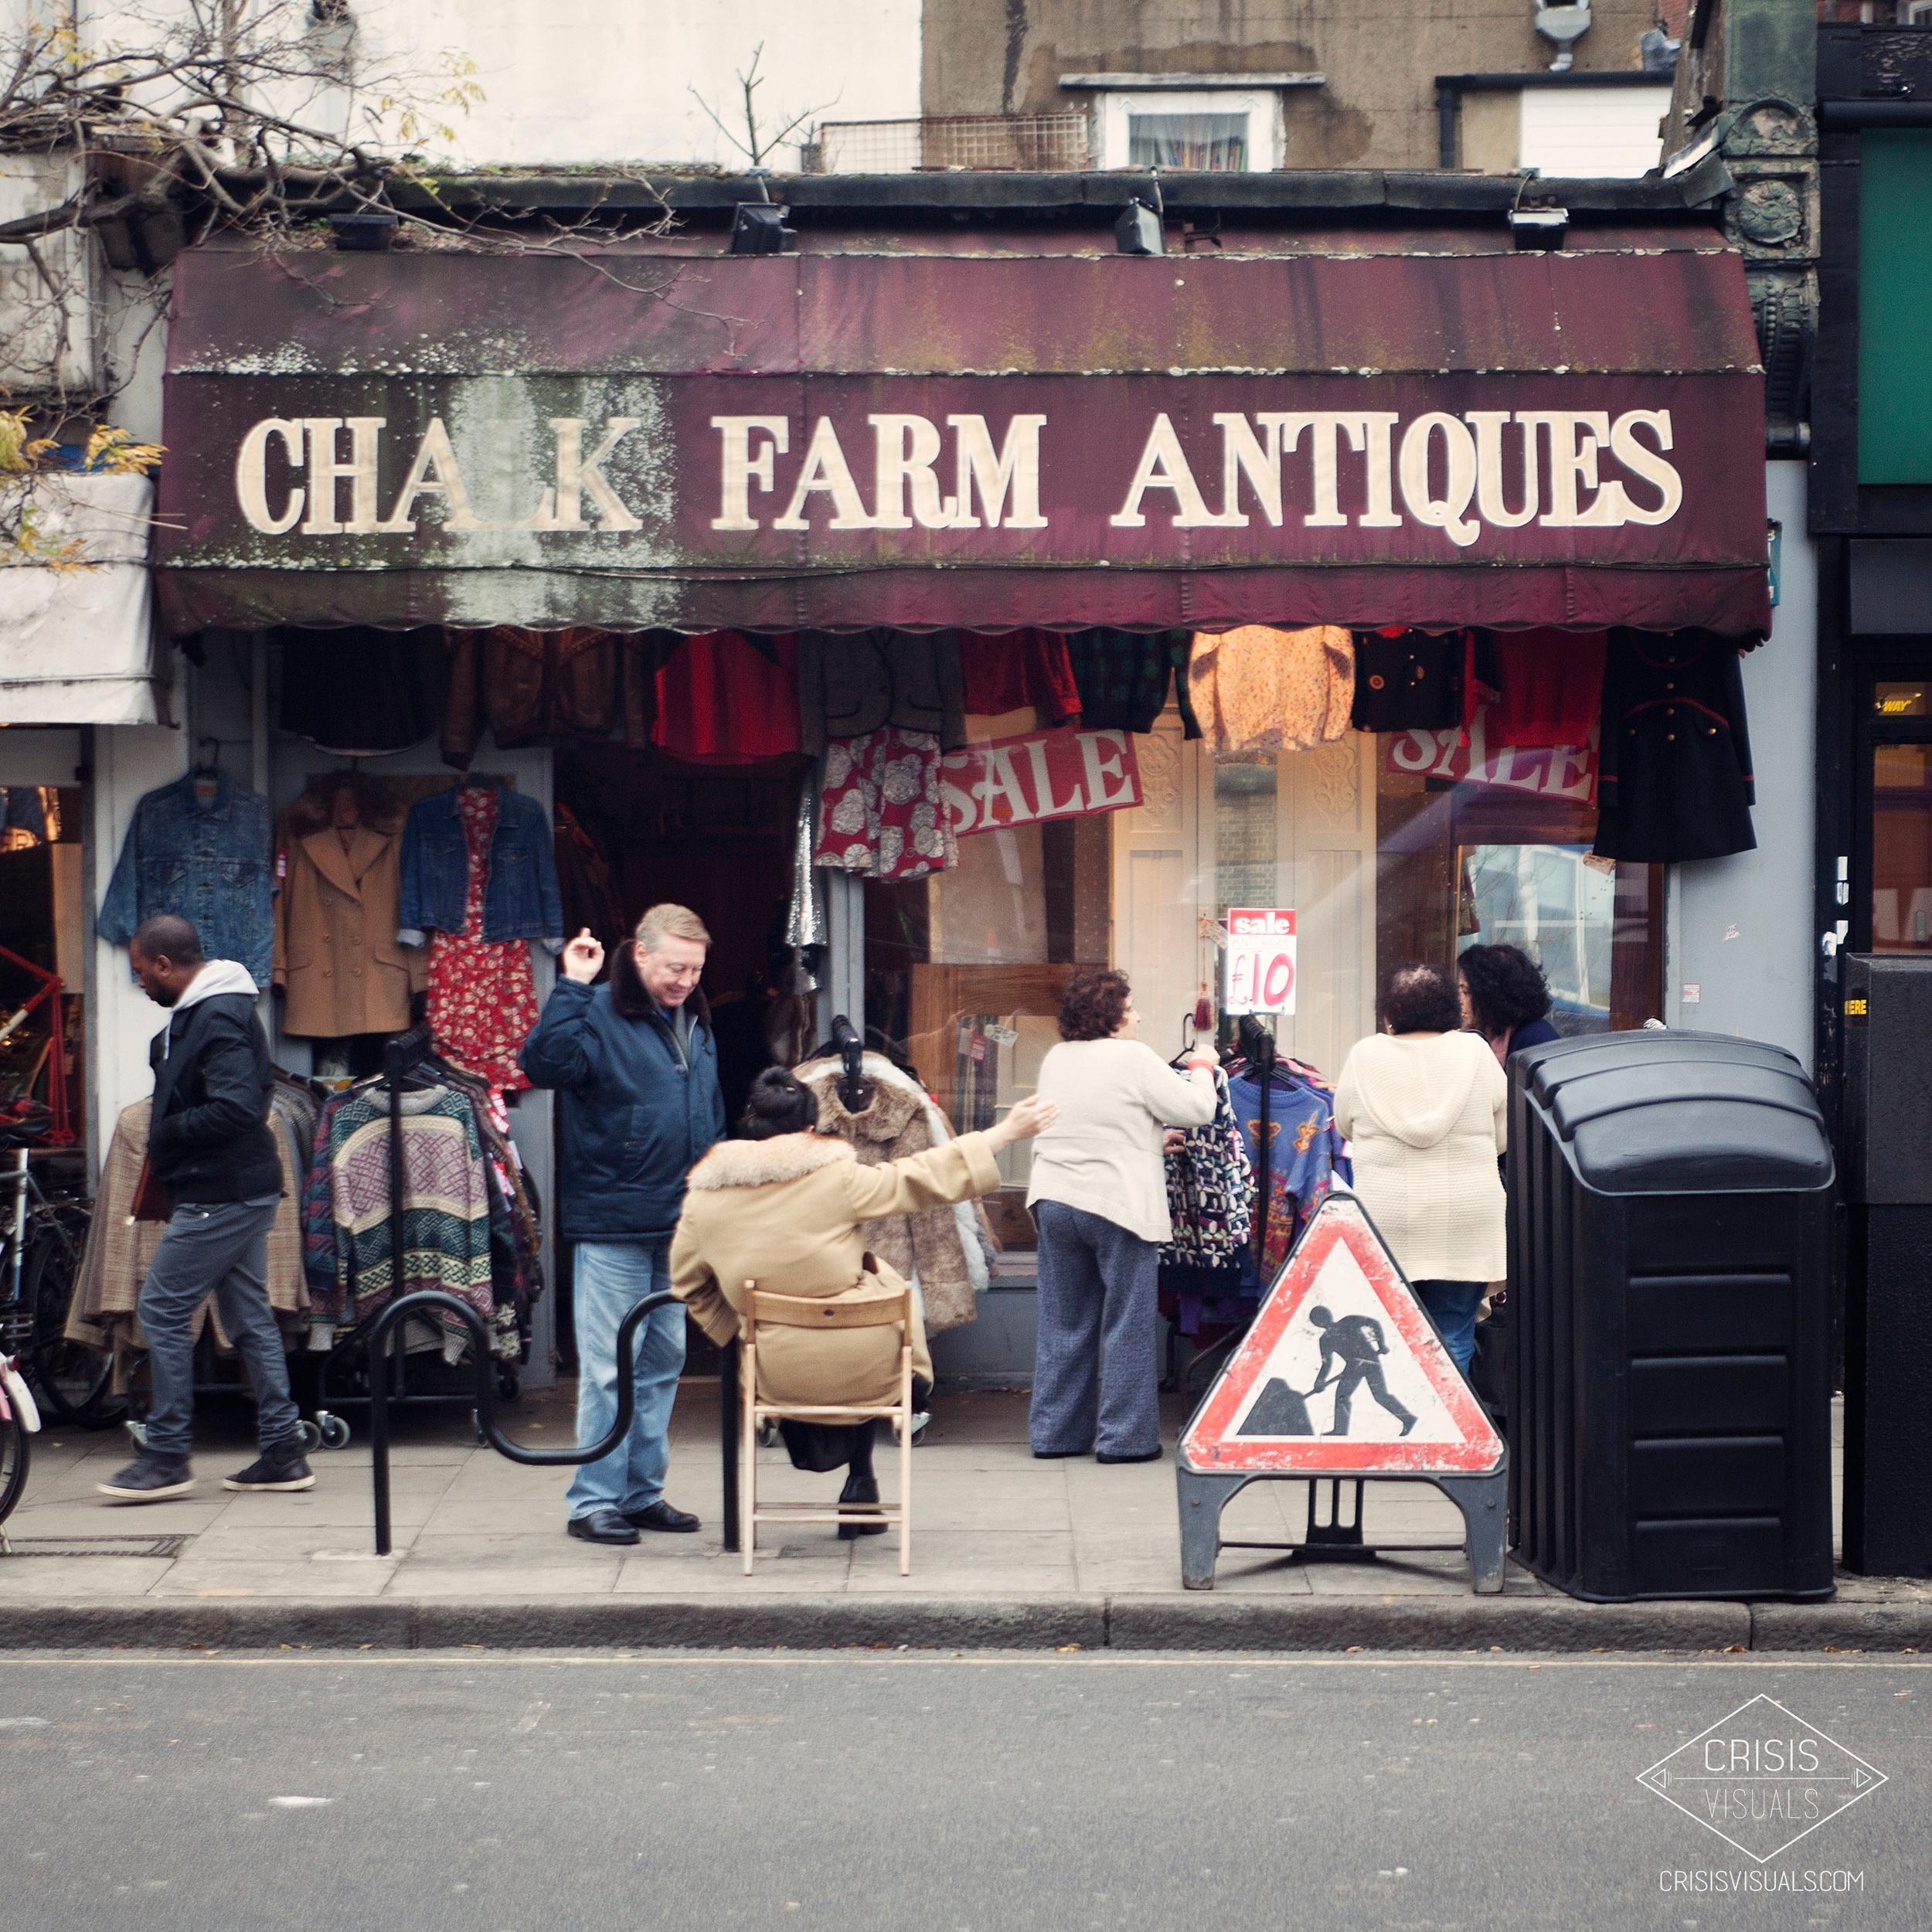 Chalk Farm Antiques